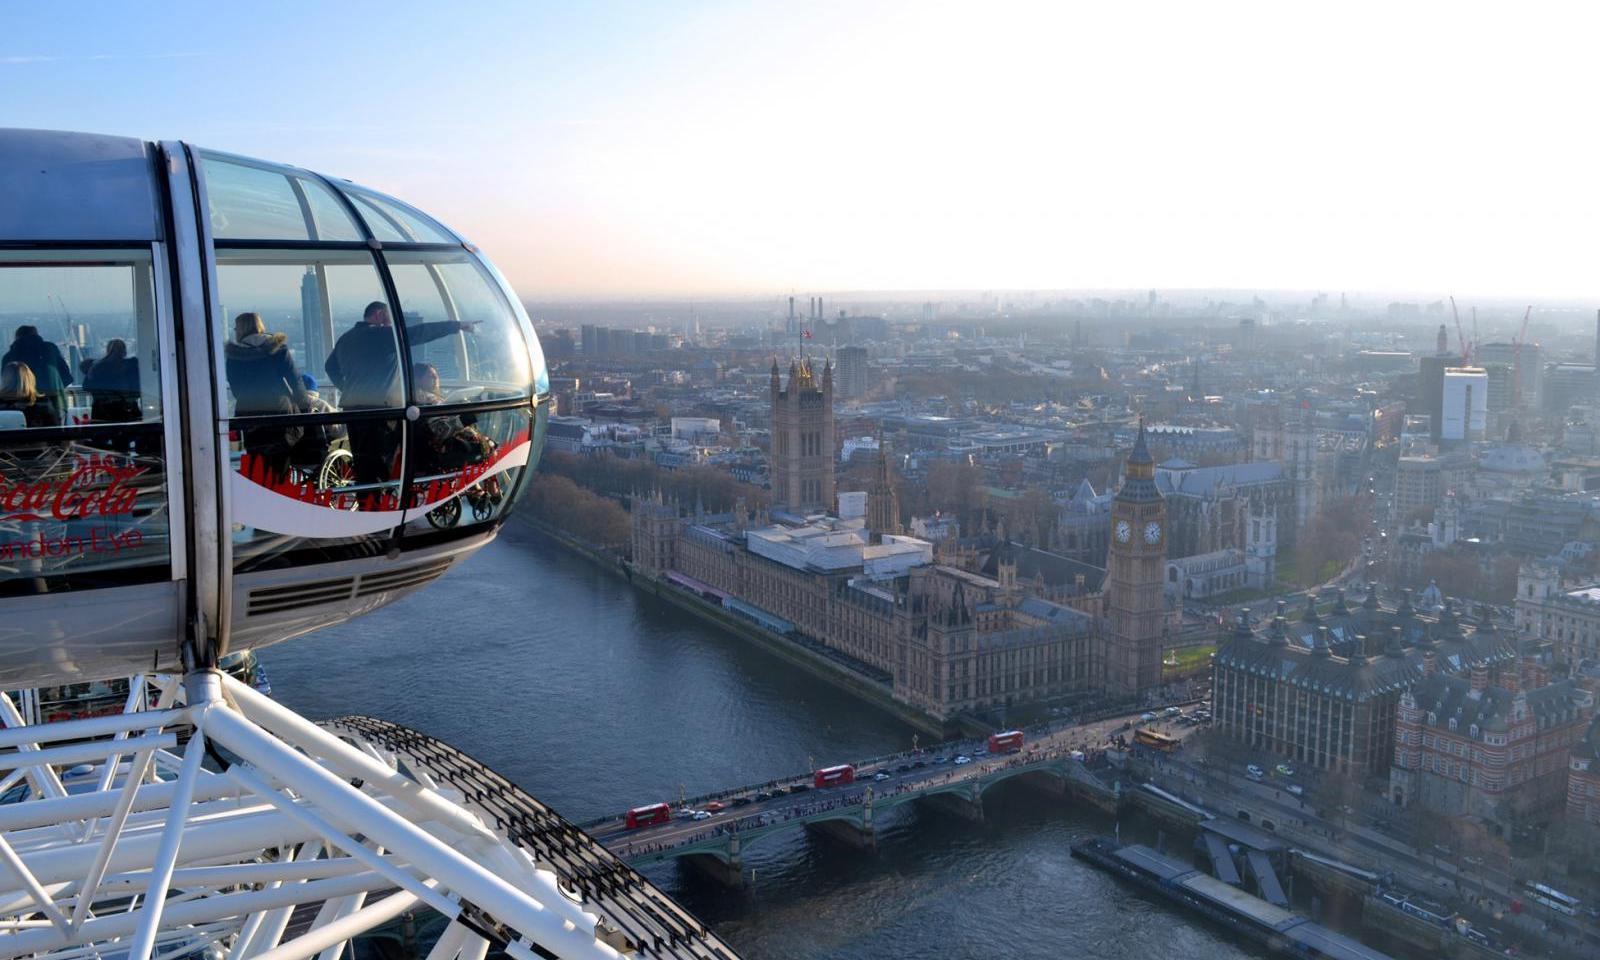 London Eye Restaurants